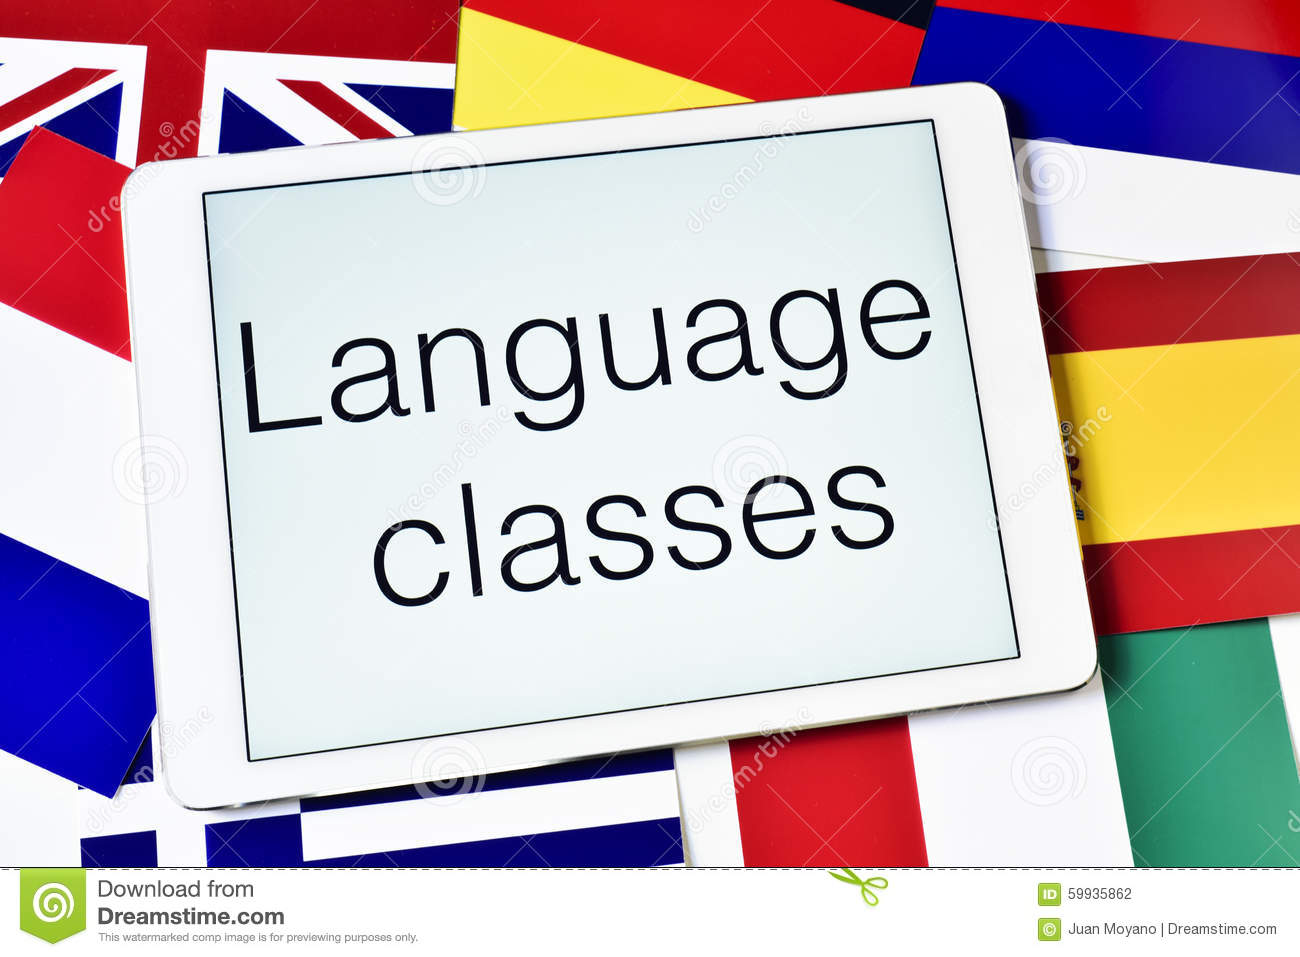 Mongolian Language Classes in Ghaziabad | Mongolian Language Course in Ghaziabad